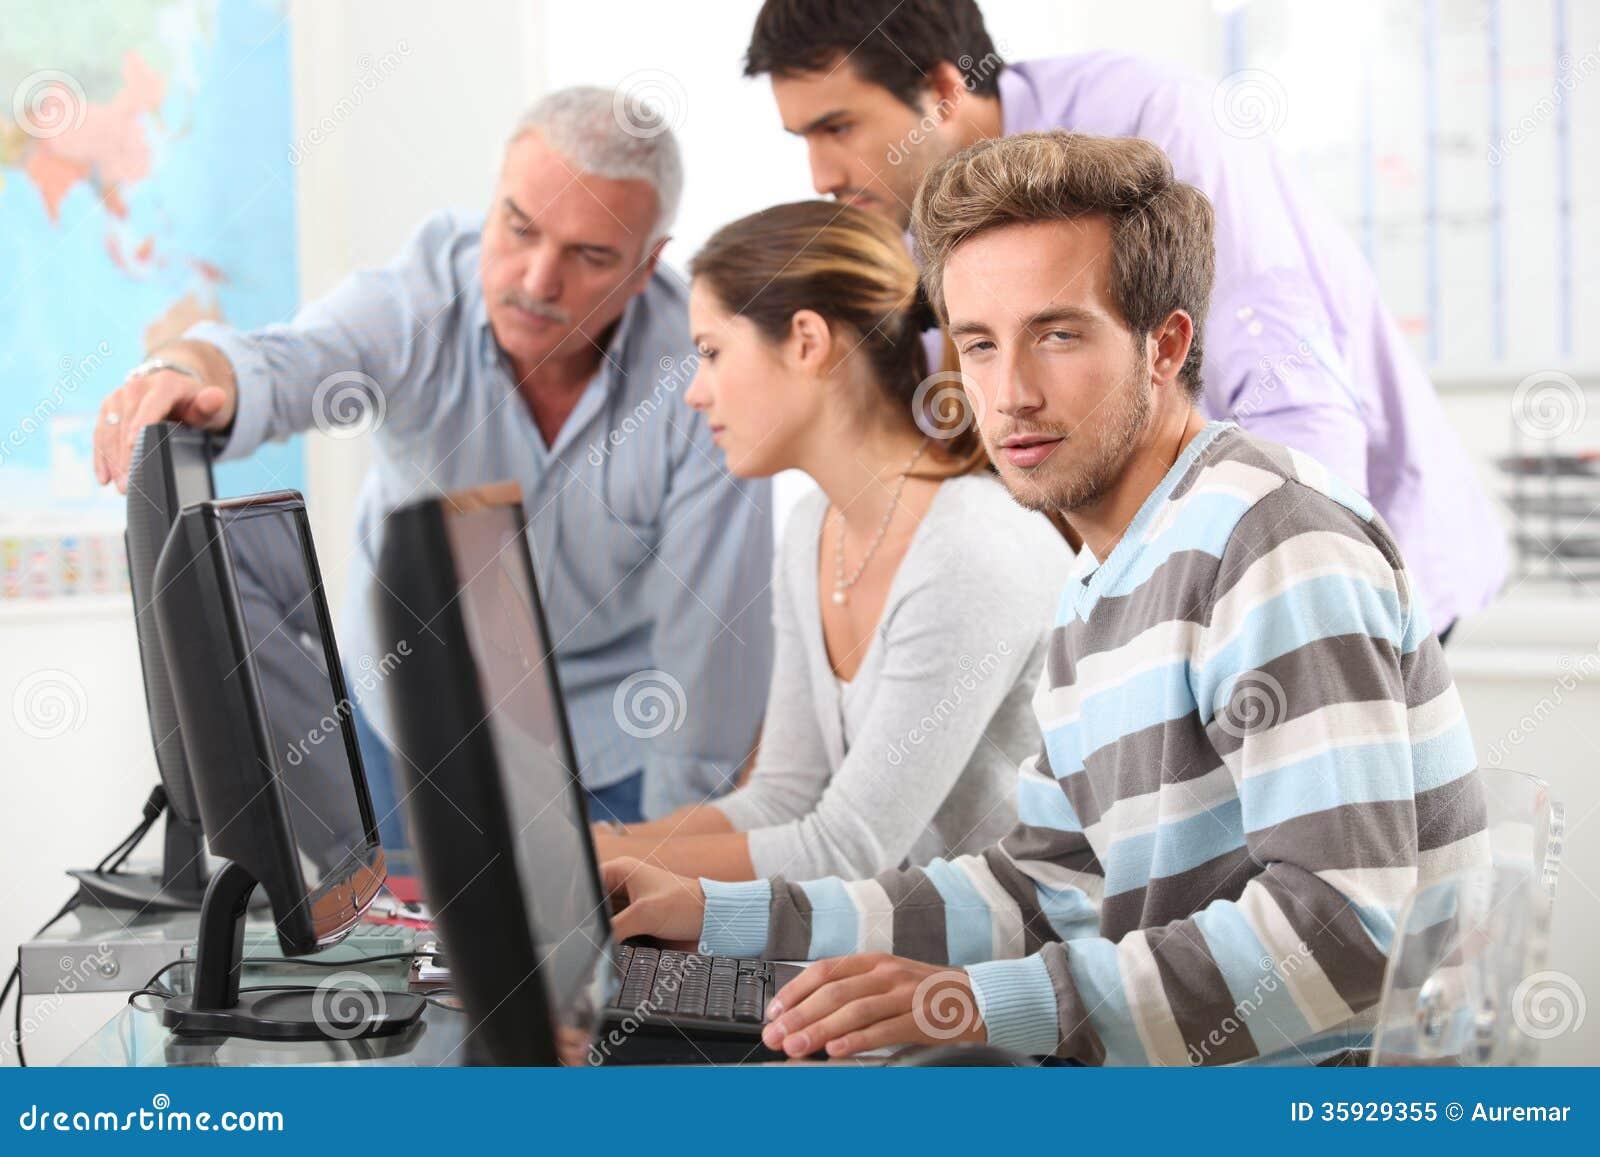 People Working On Computers Stock Image - Image: 35929355